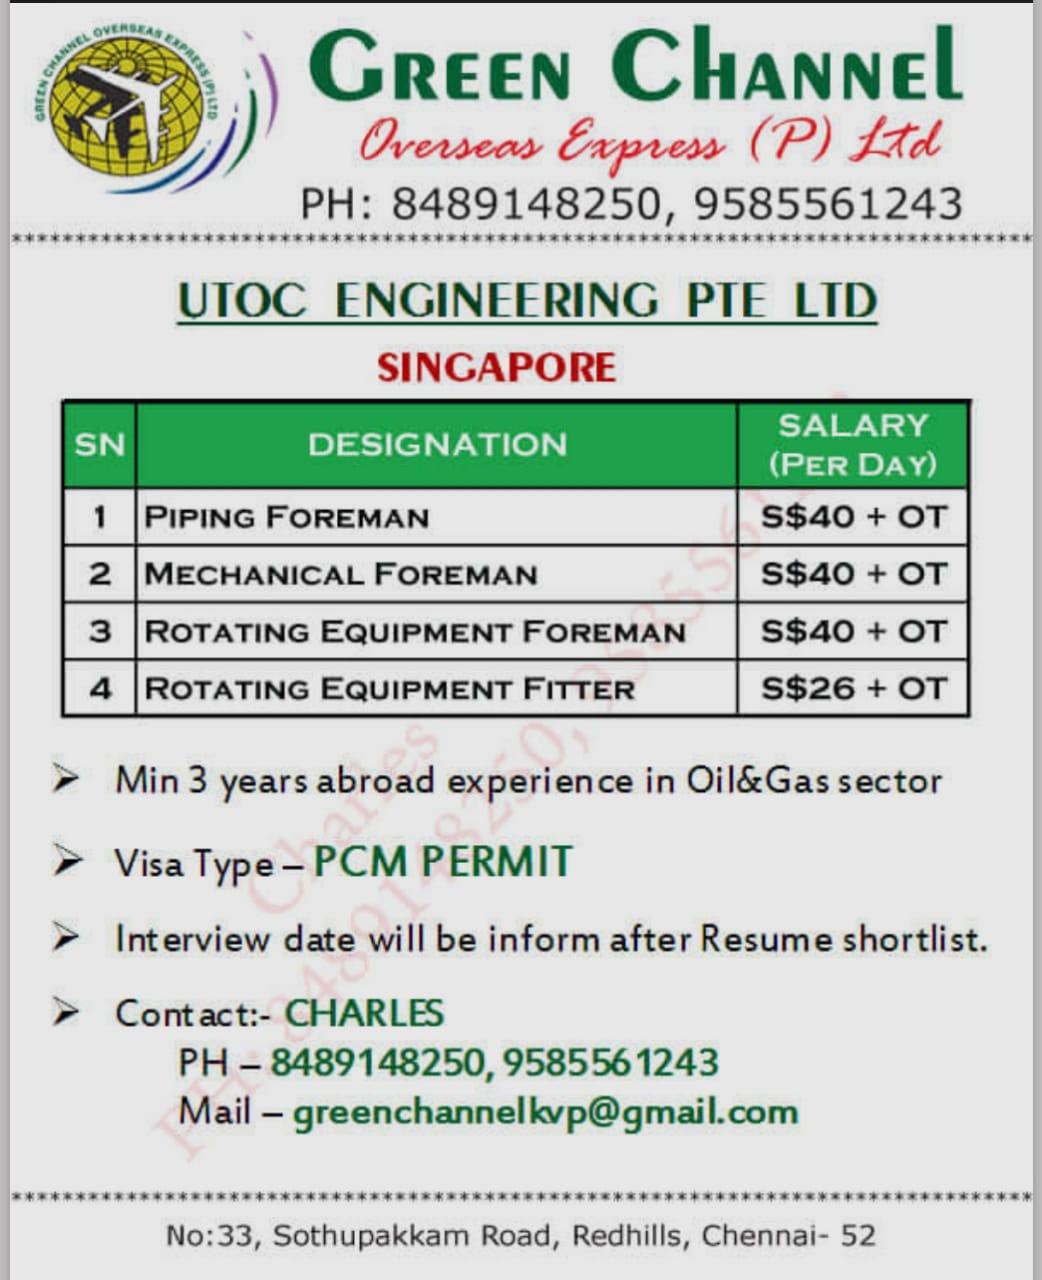 UTOC ENGINEERING PTE LTD SINGAPORE